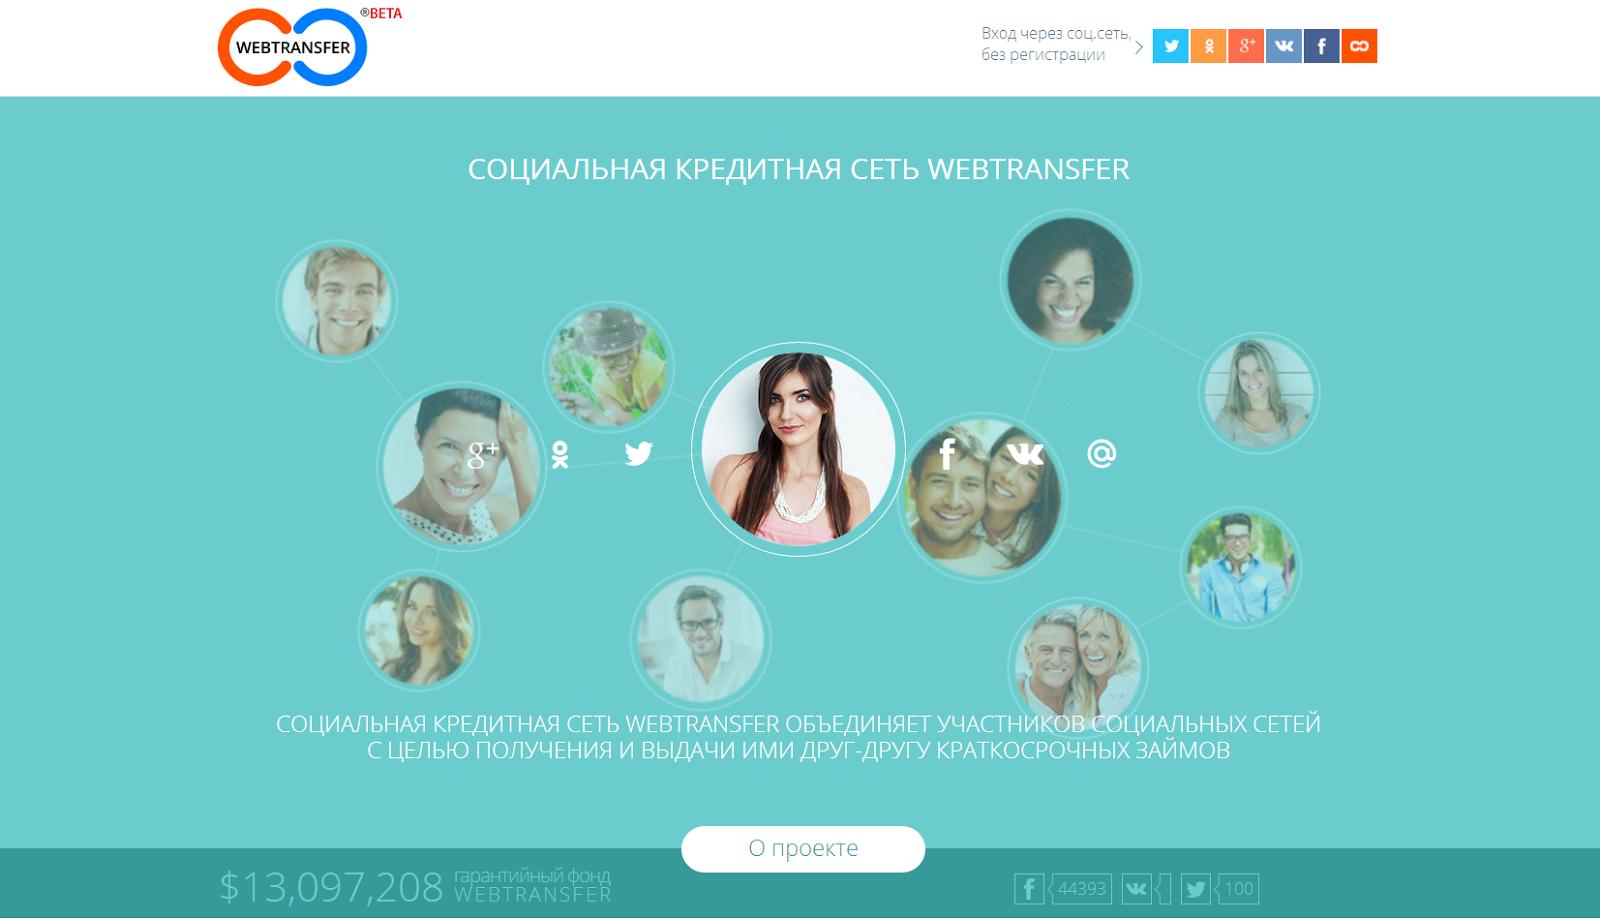 Сайты зарубежных рунеток 26 фотография